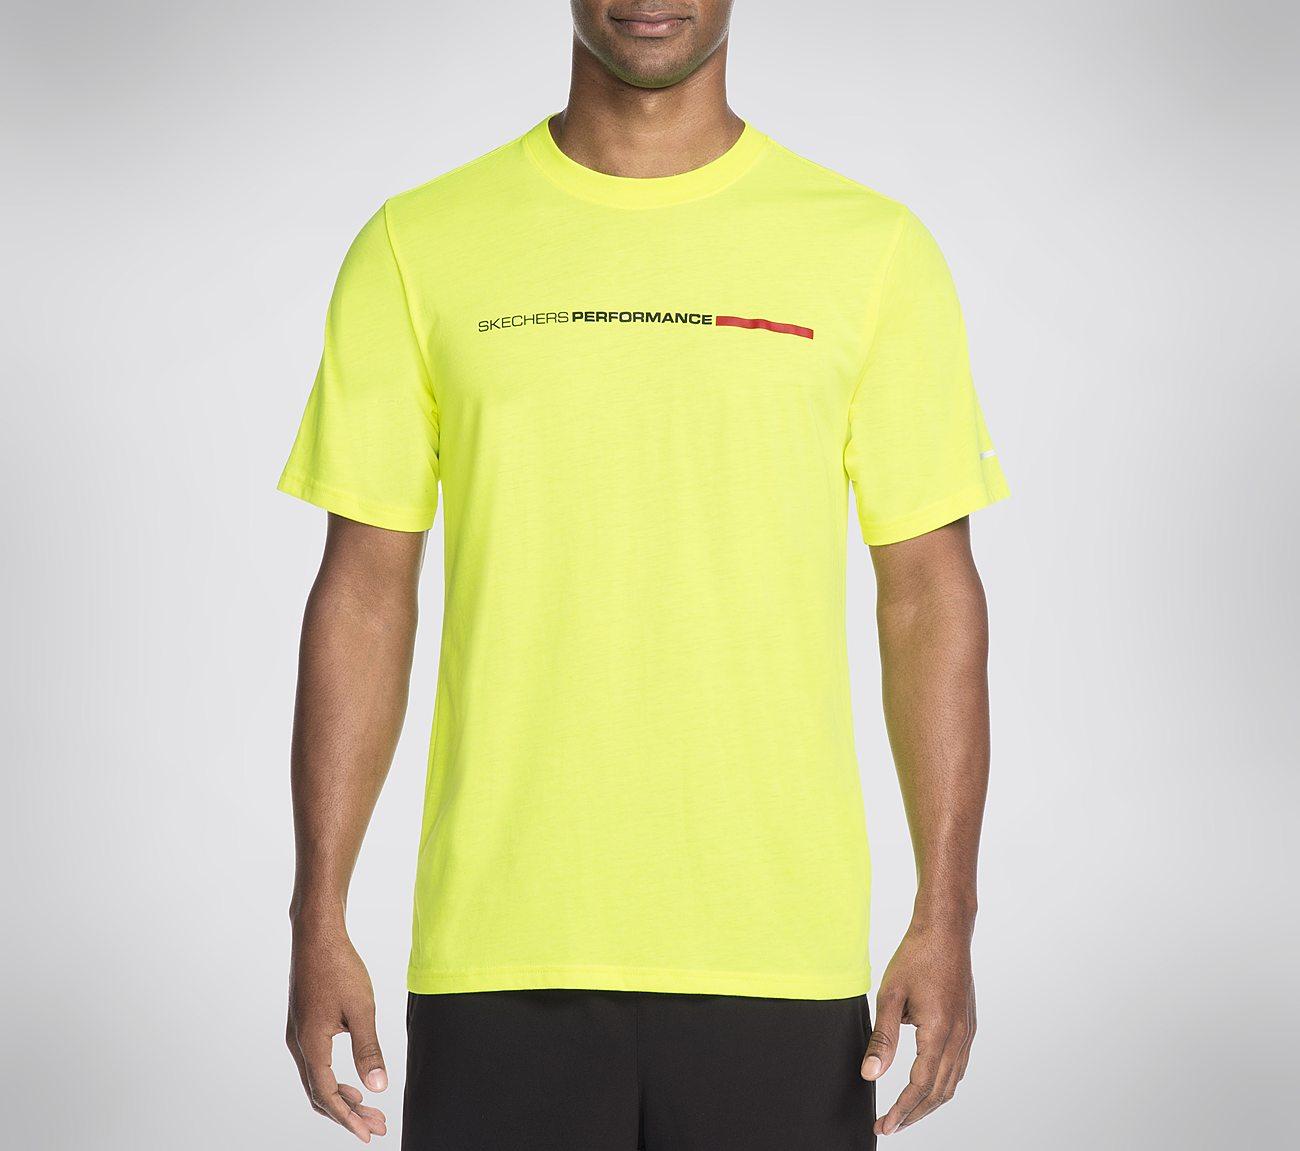 Buy SKECHERS SP Single Bar Tee Shirt